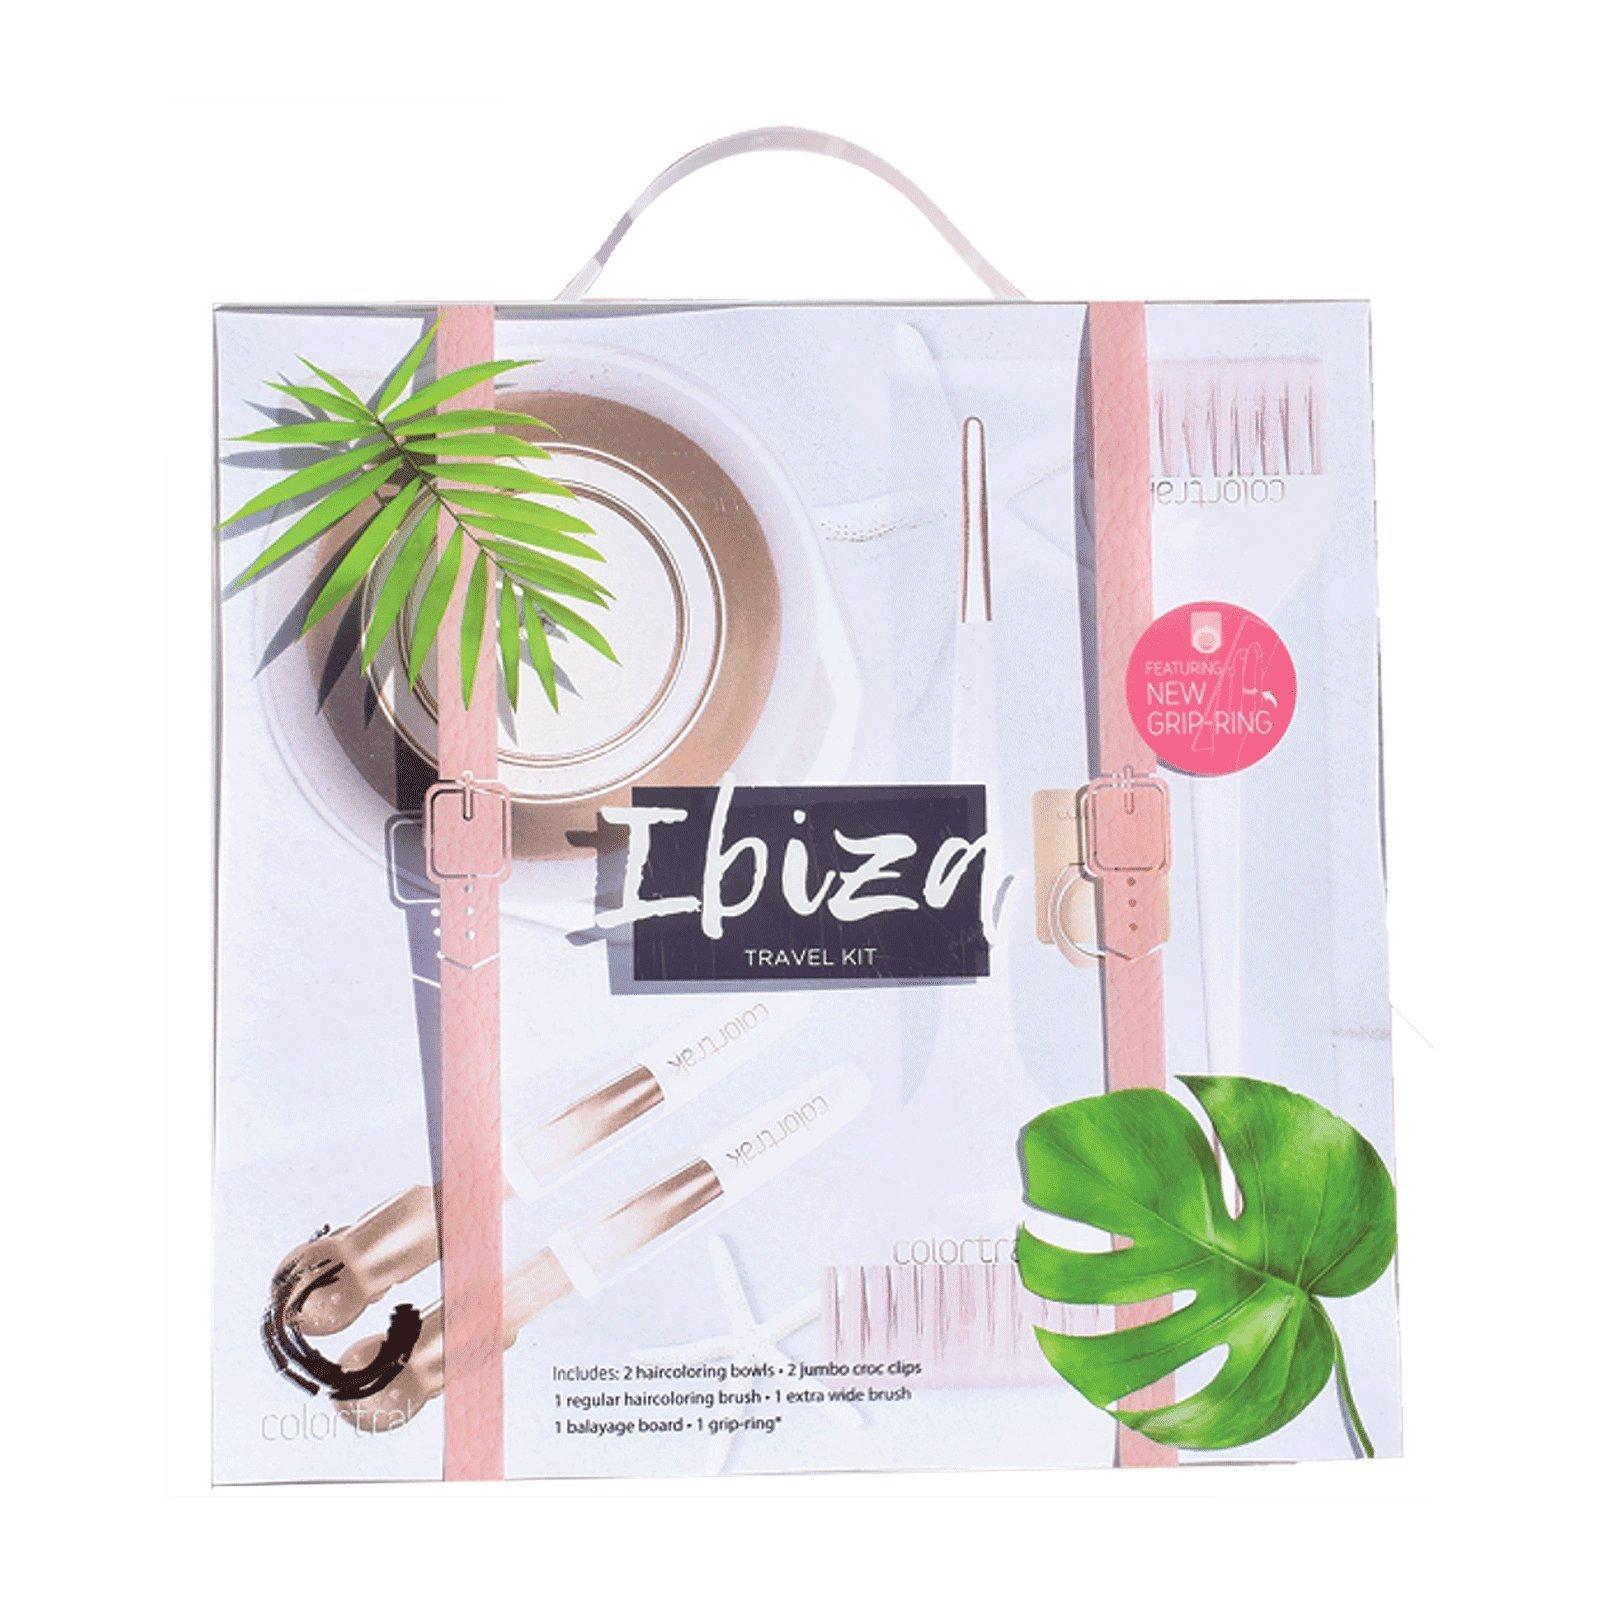 Betty Dain Colortrak Ibiza Collection Stylist Kit - Clips, Brush, Bowl, Board